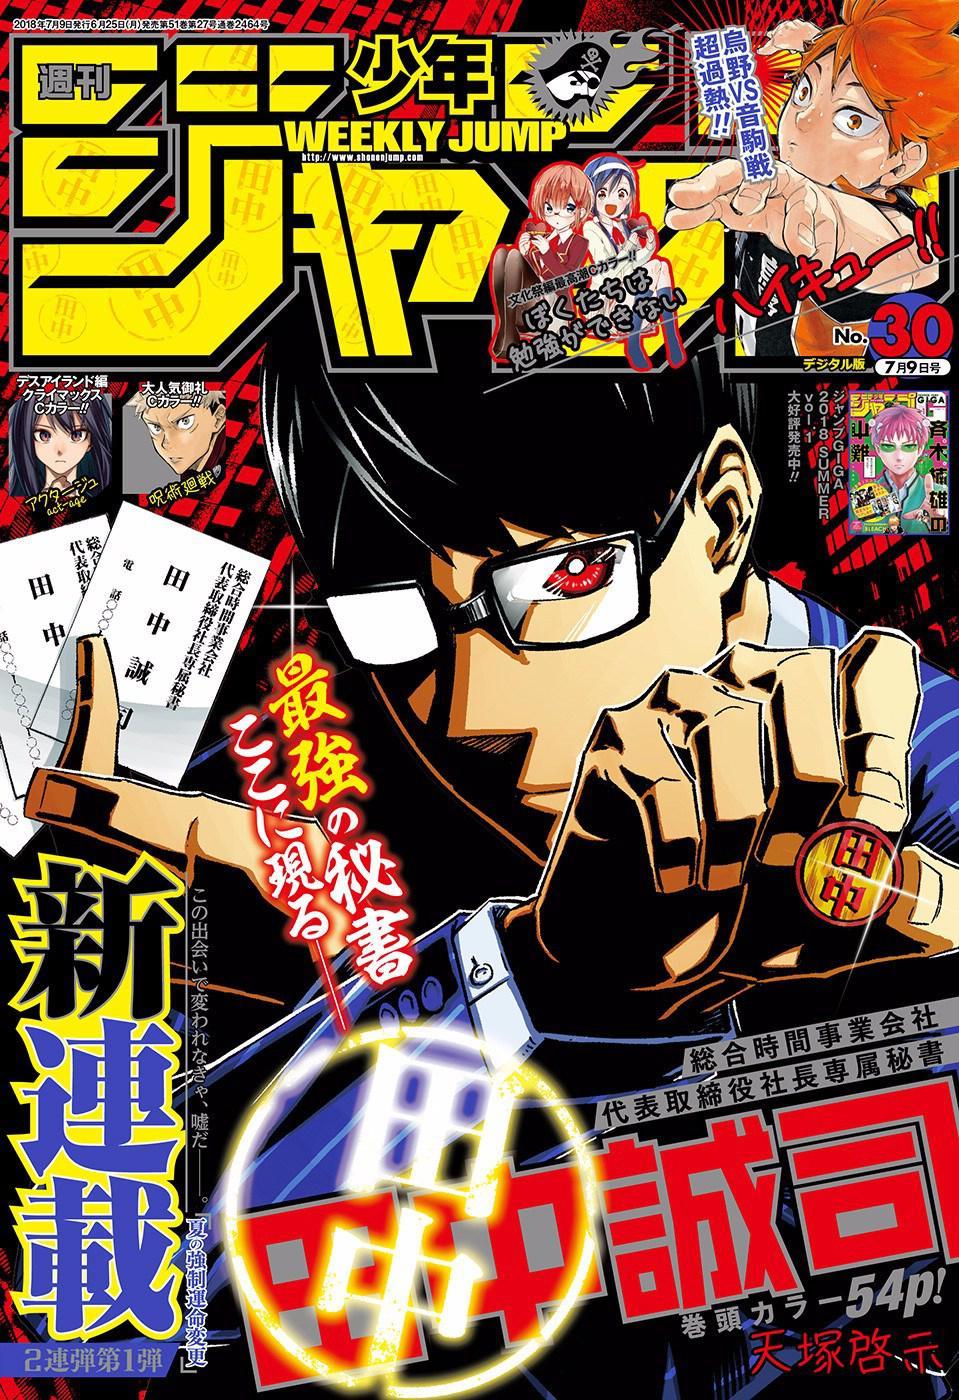 https://nine.mangadogs.com/fr_manga/pic1/57/121/4673/d5ab5dc428583f7399c83f71a6a2e9c2.jpg Page 1